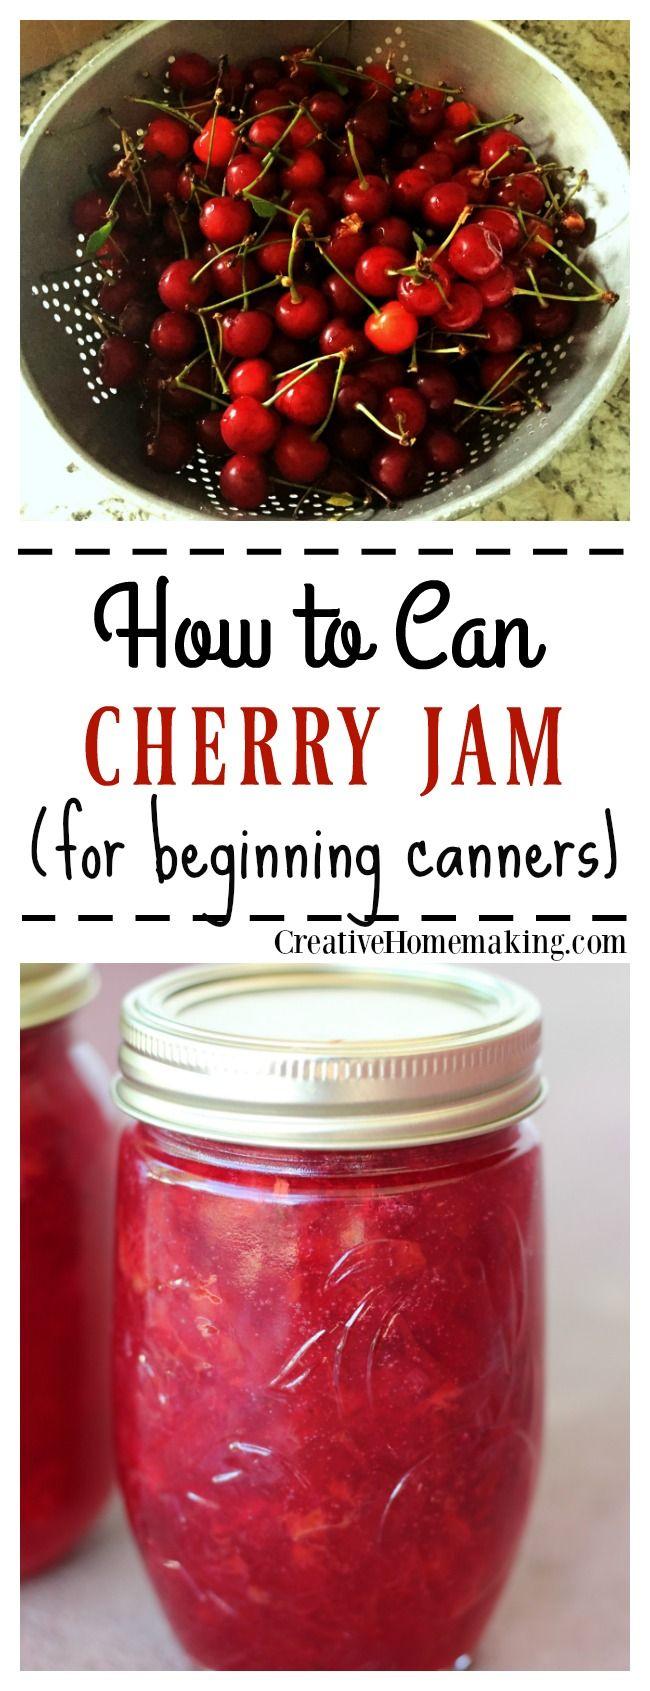 Recipe for canning homemade cherry jam.